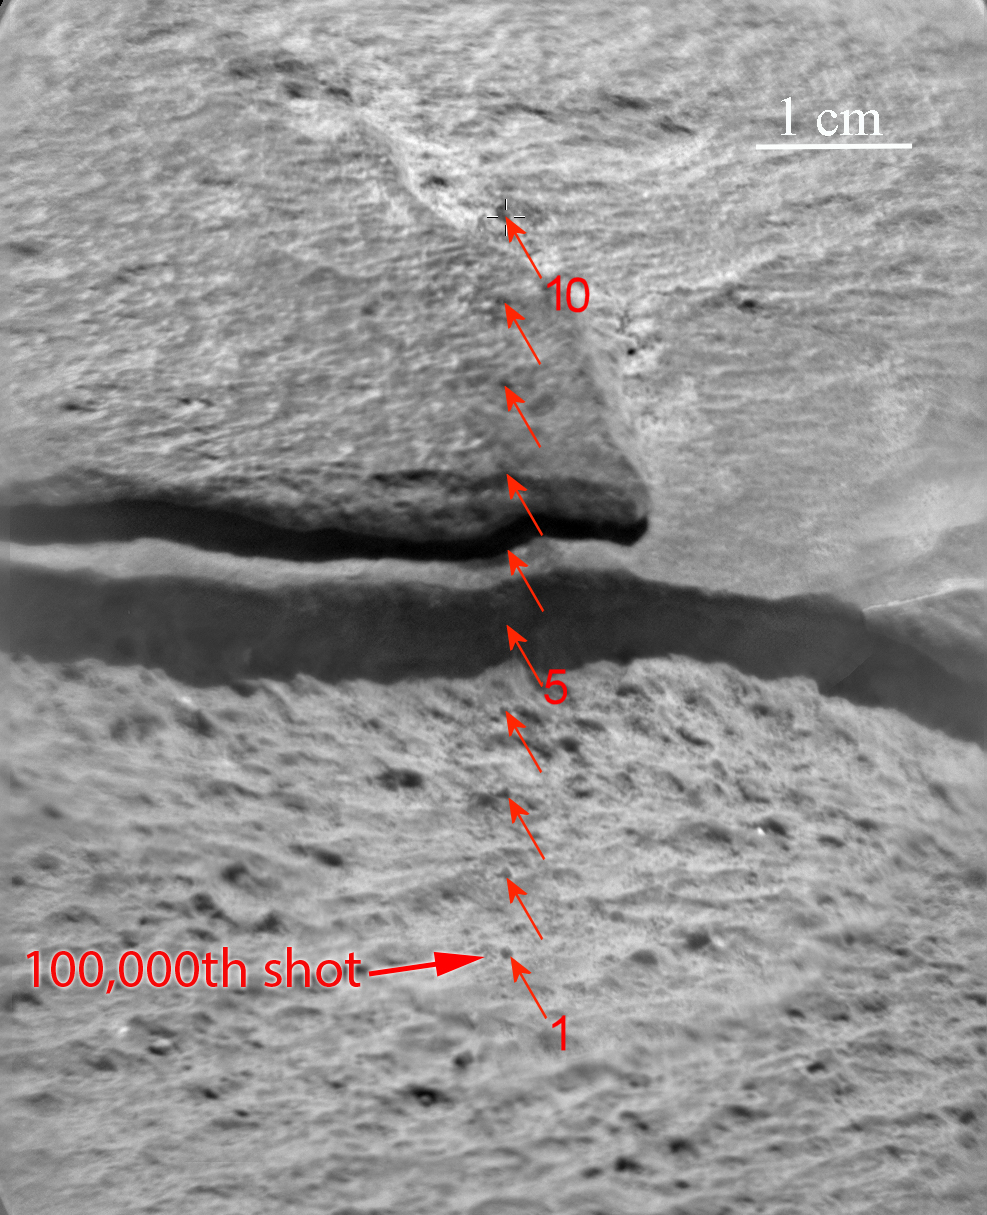 mars rover laser camera - photo #8